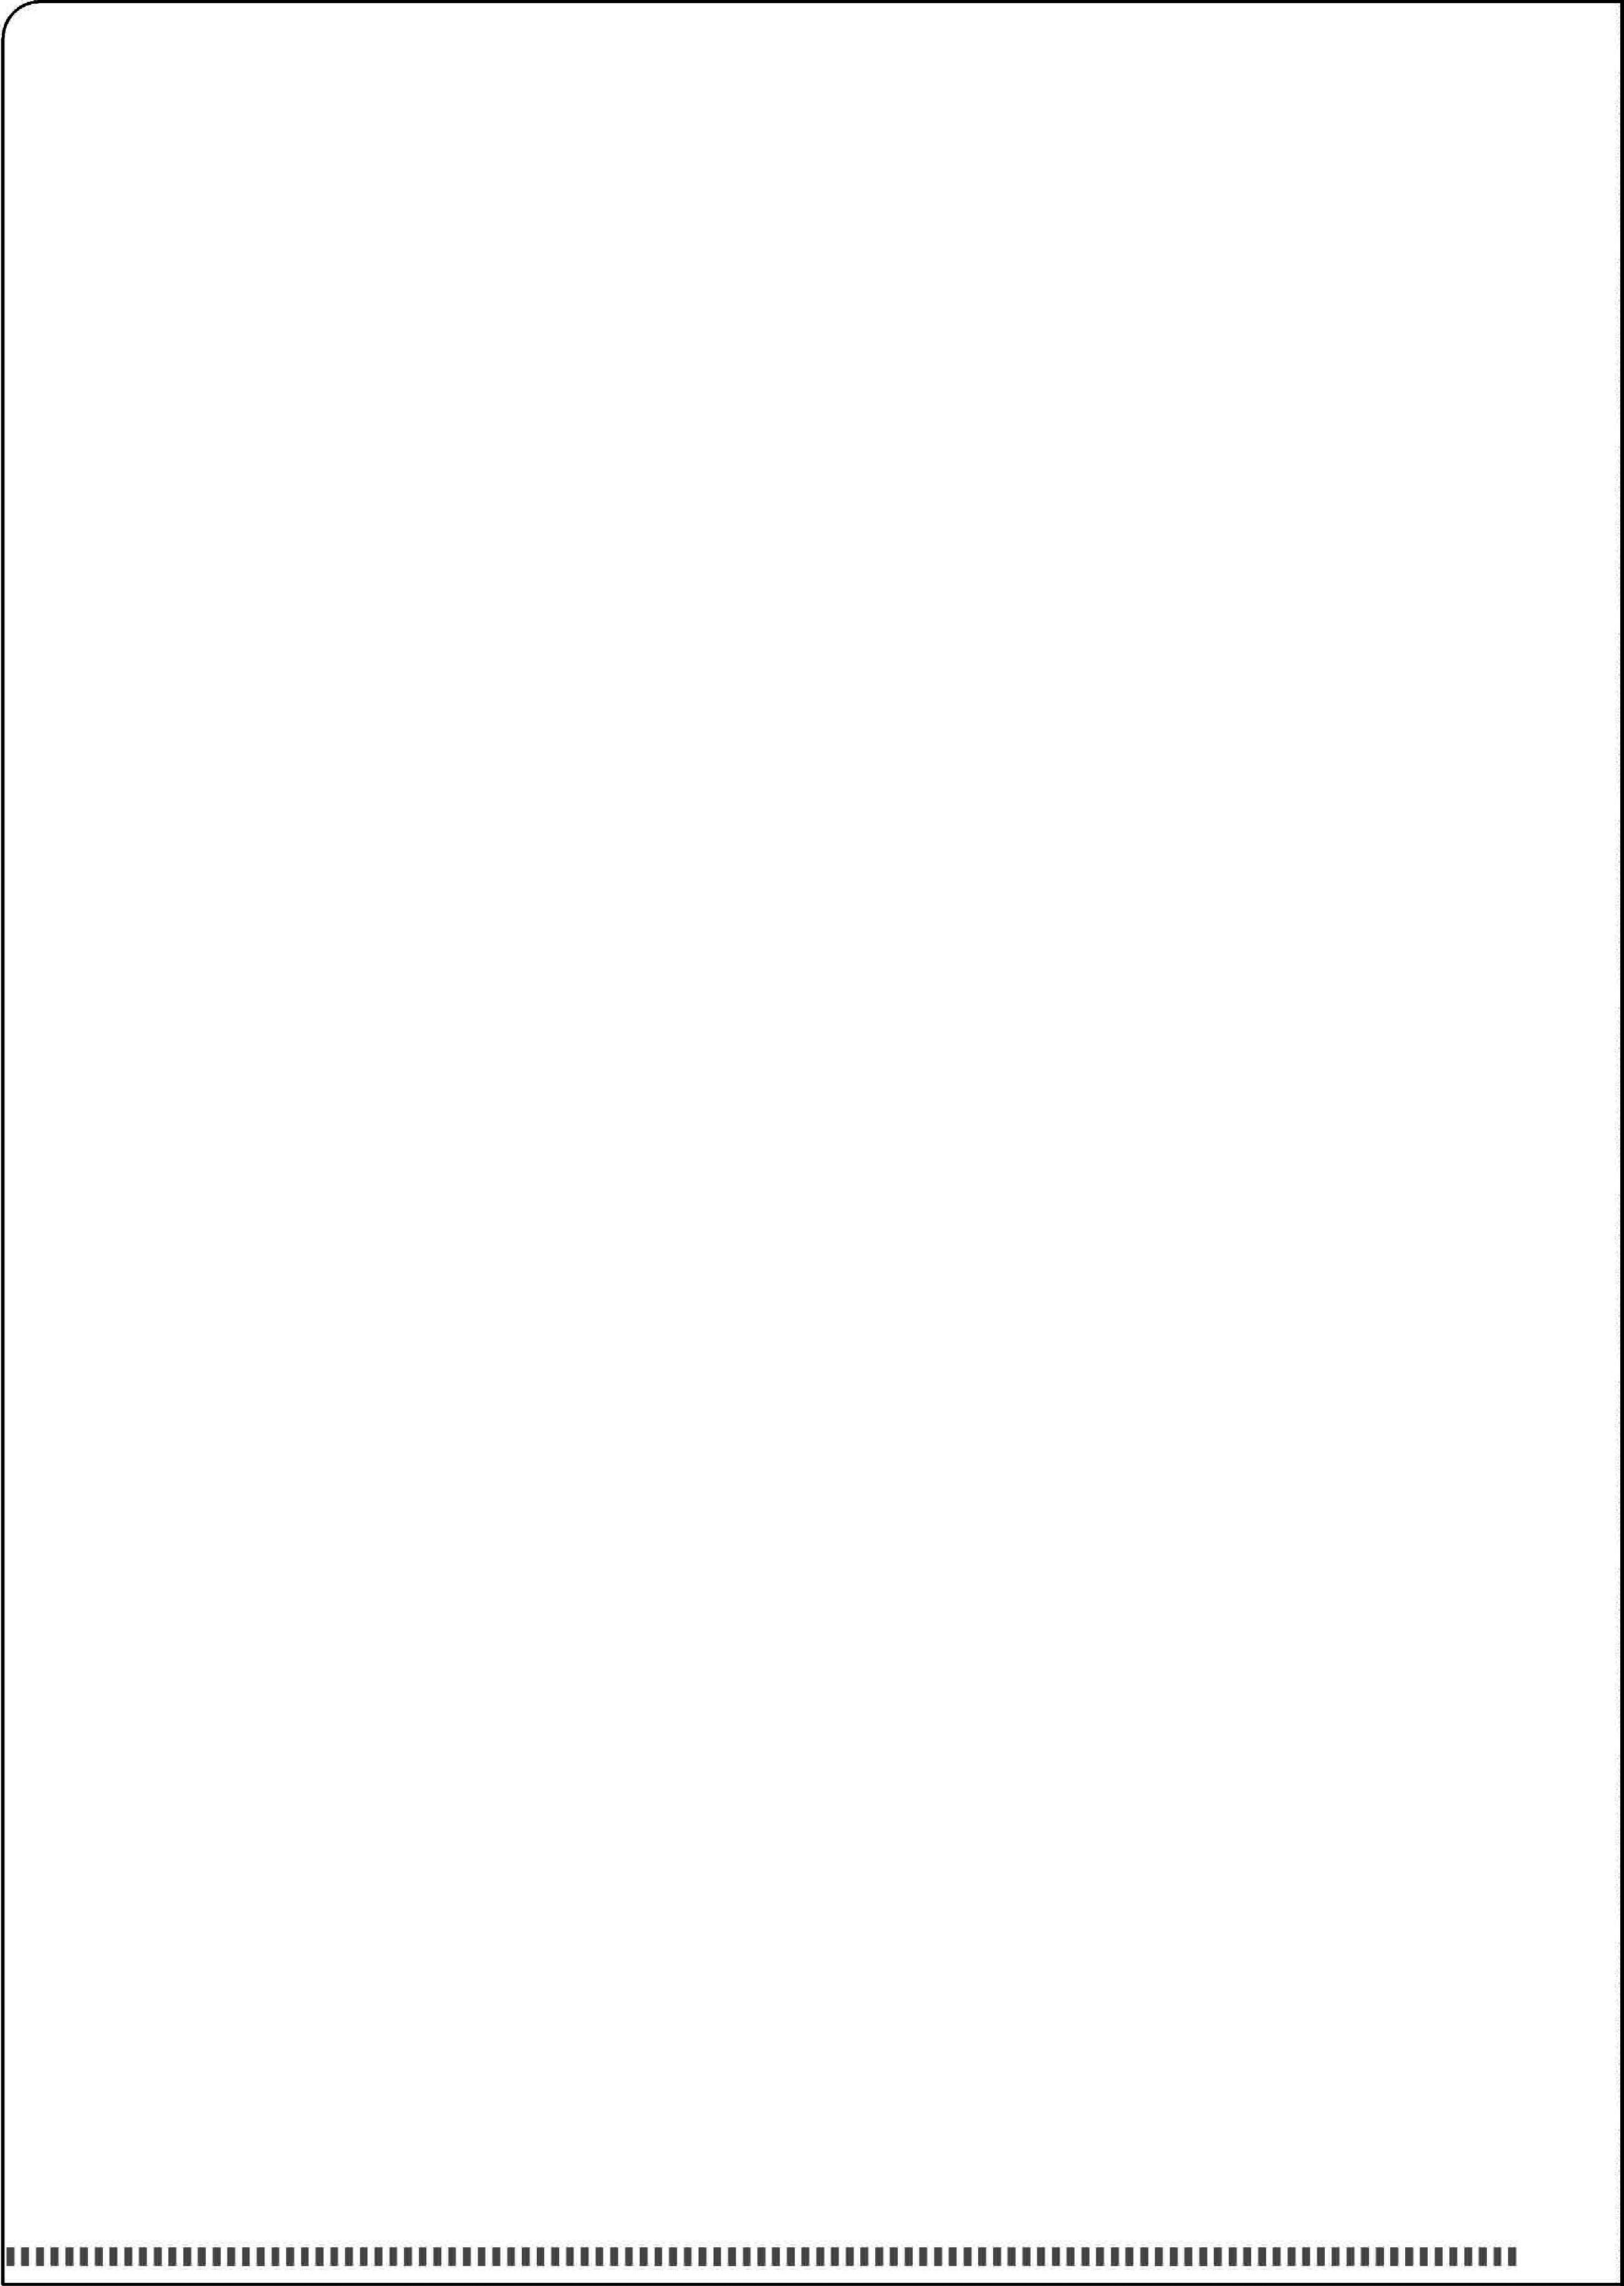 A4クリアファイル オンデマンド印刷